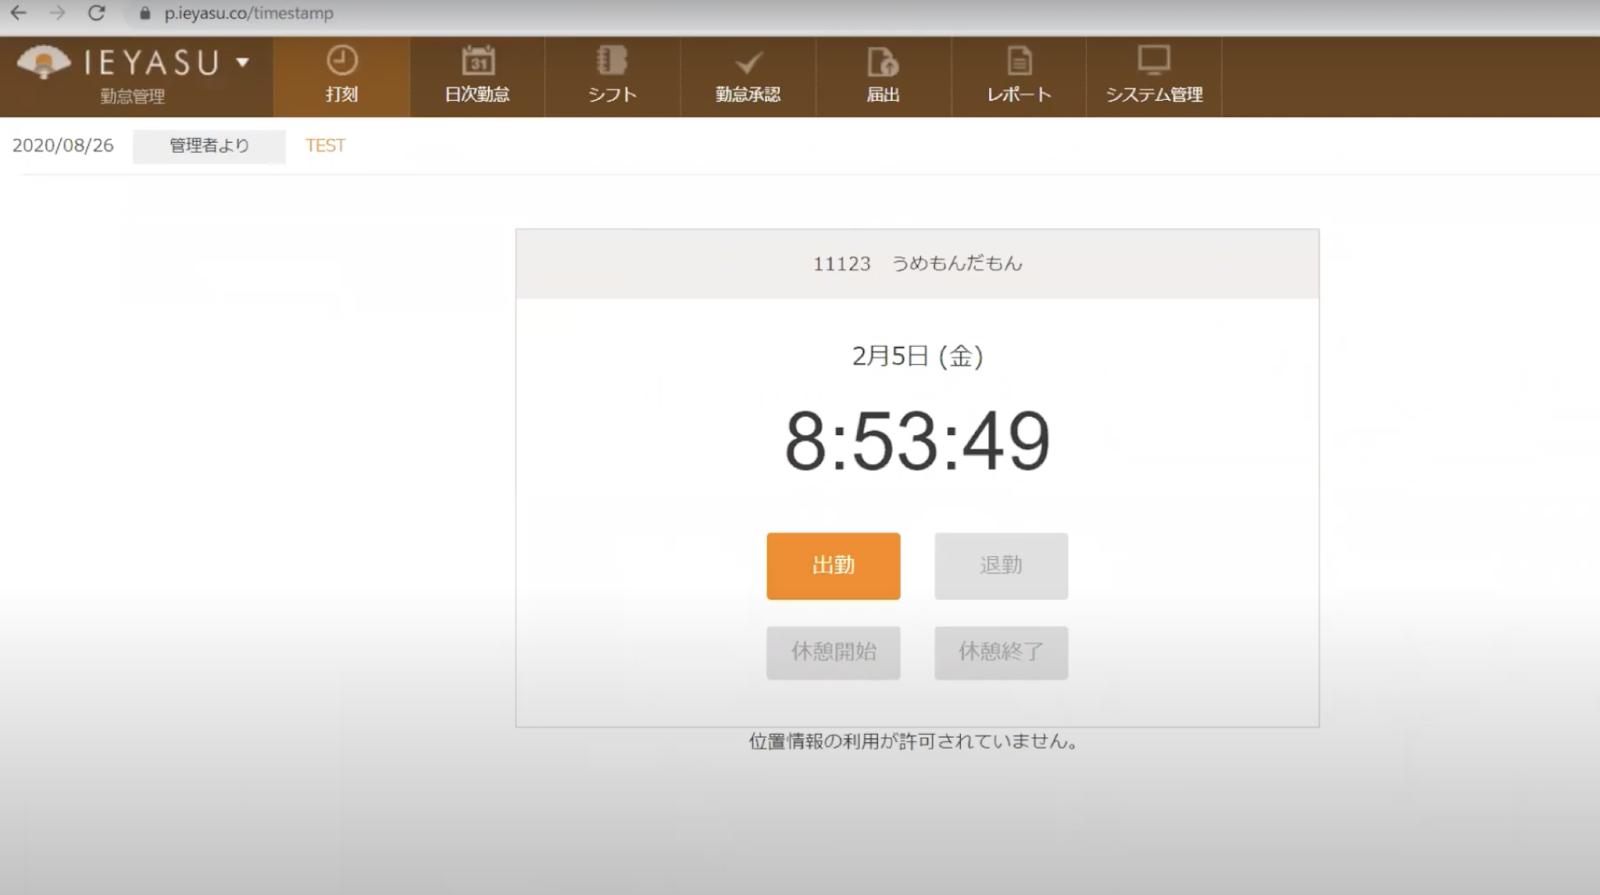 IEYASU打刻画面1